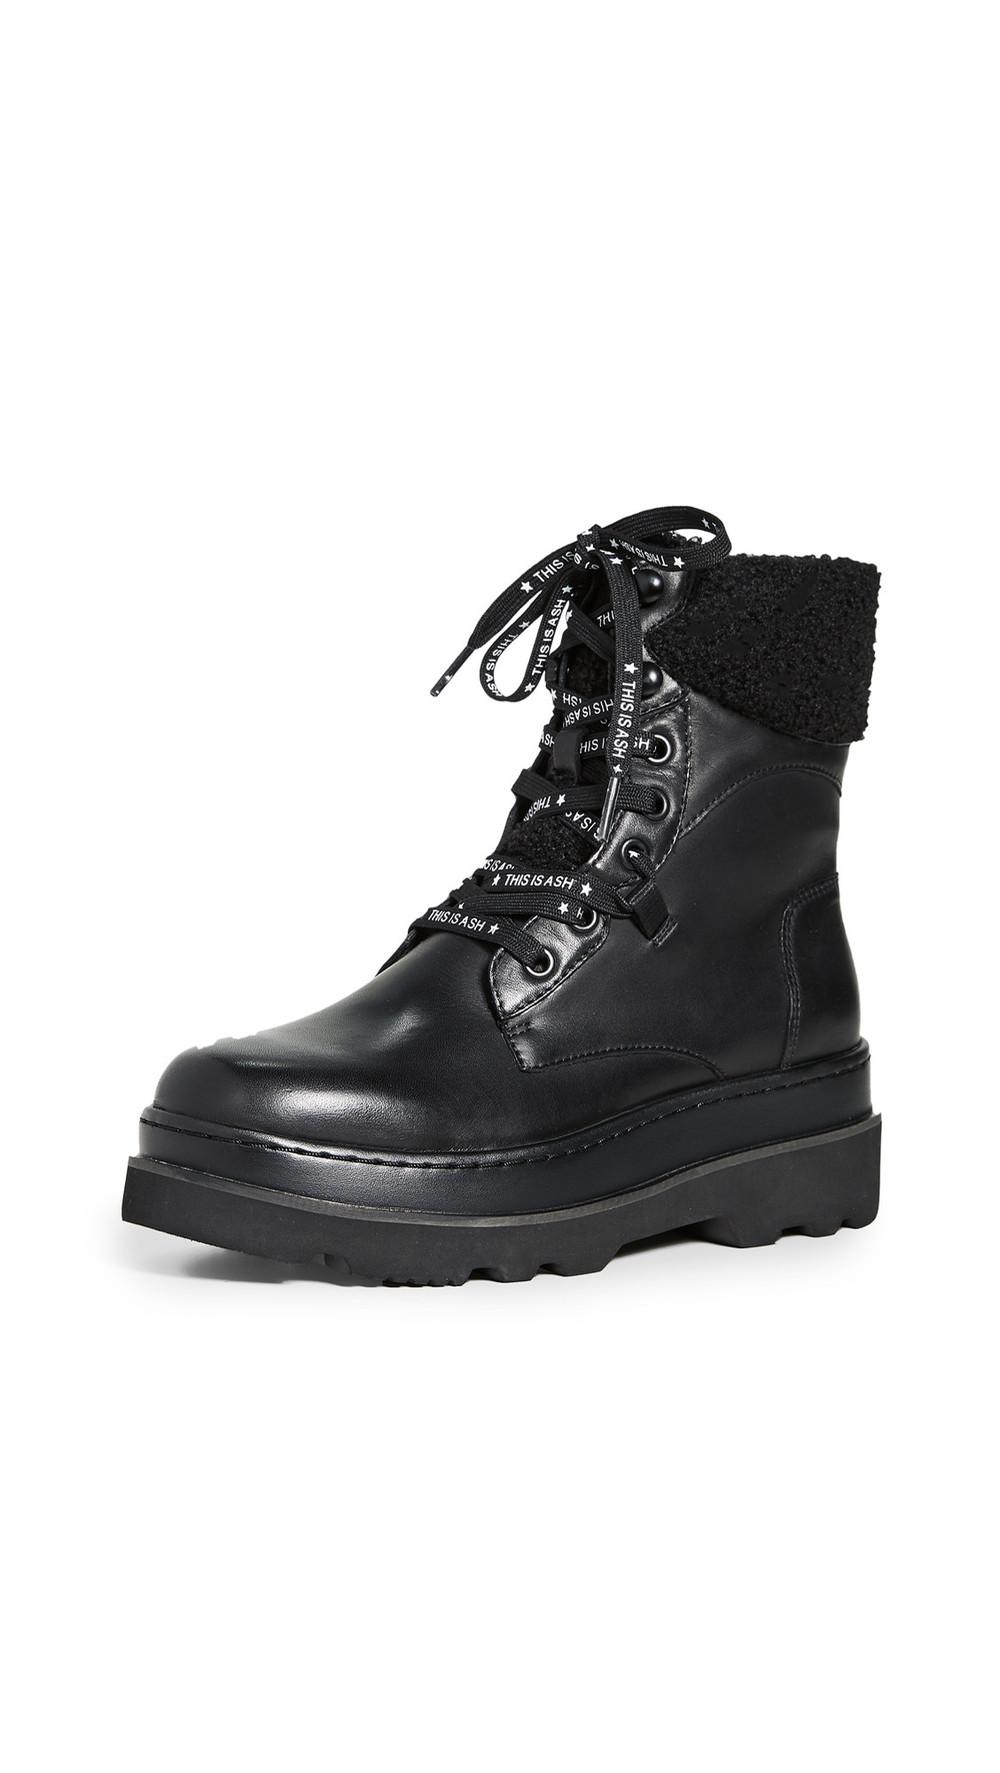 Ash Siberia Boots in black